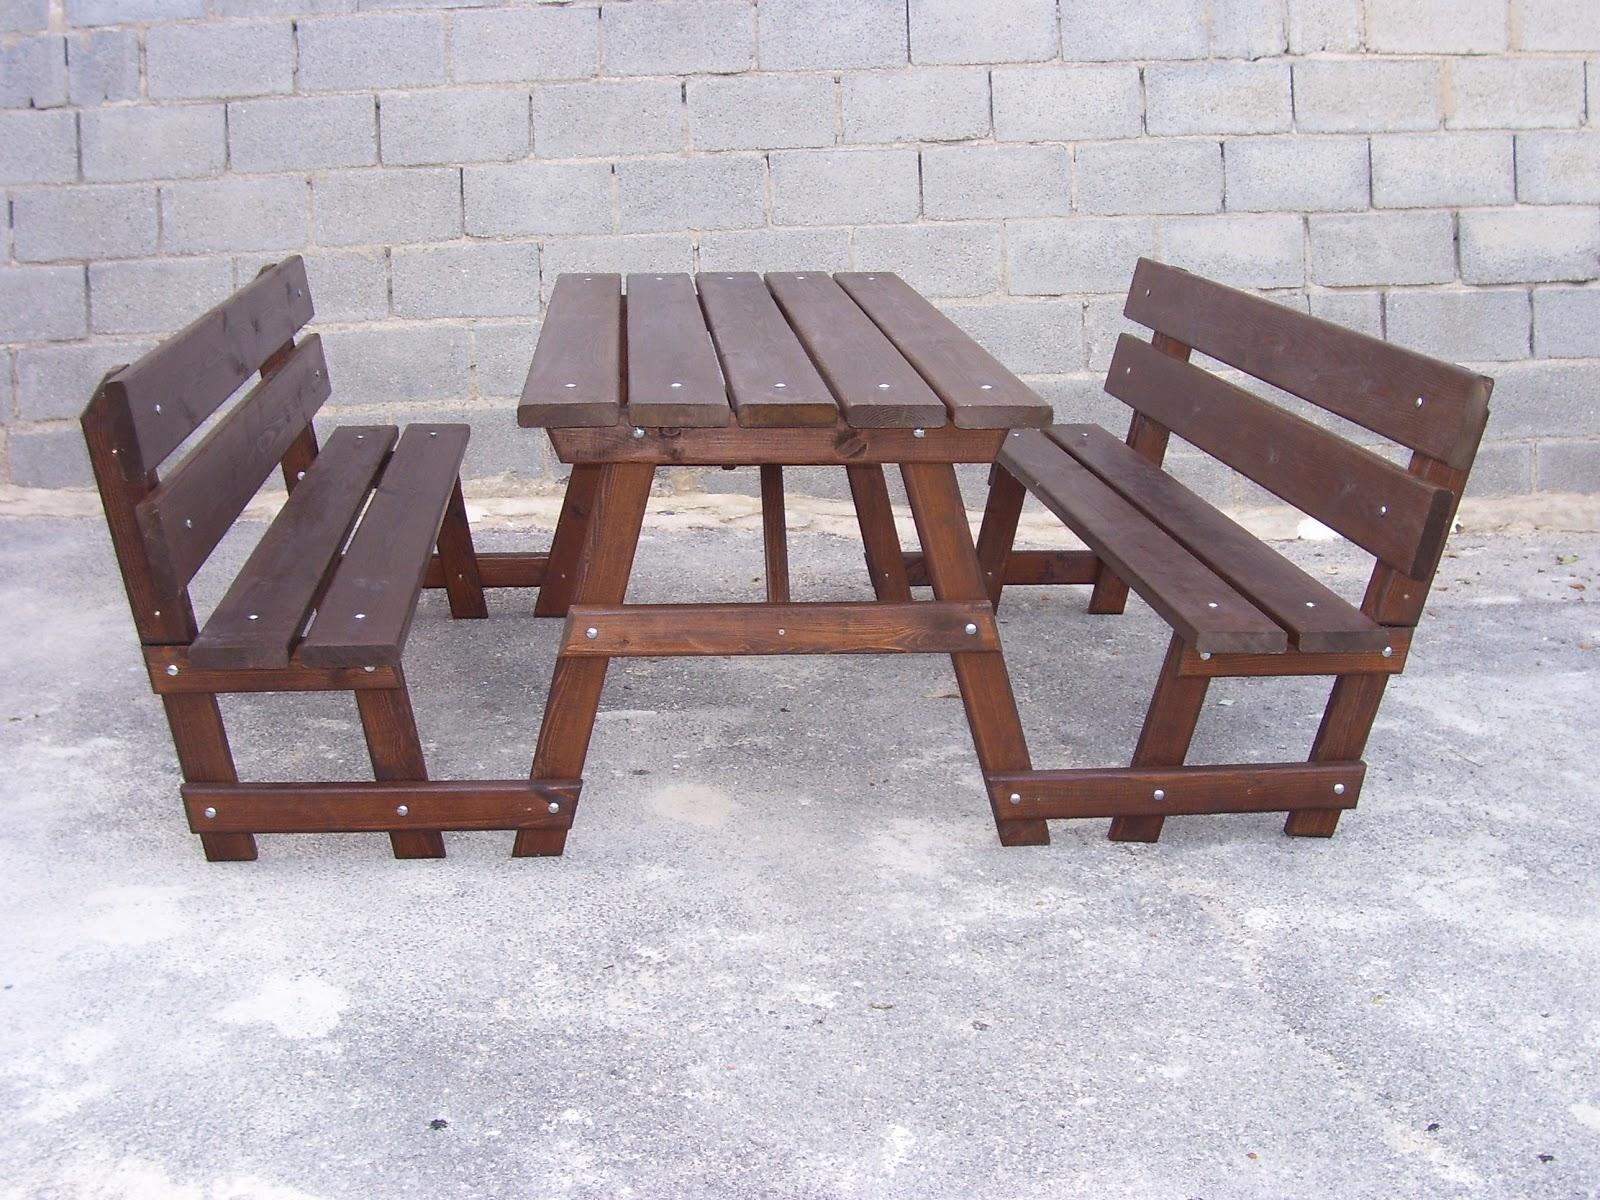 Www mesasdepicnic com mesas de picnic - Mesa con bancos ...